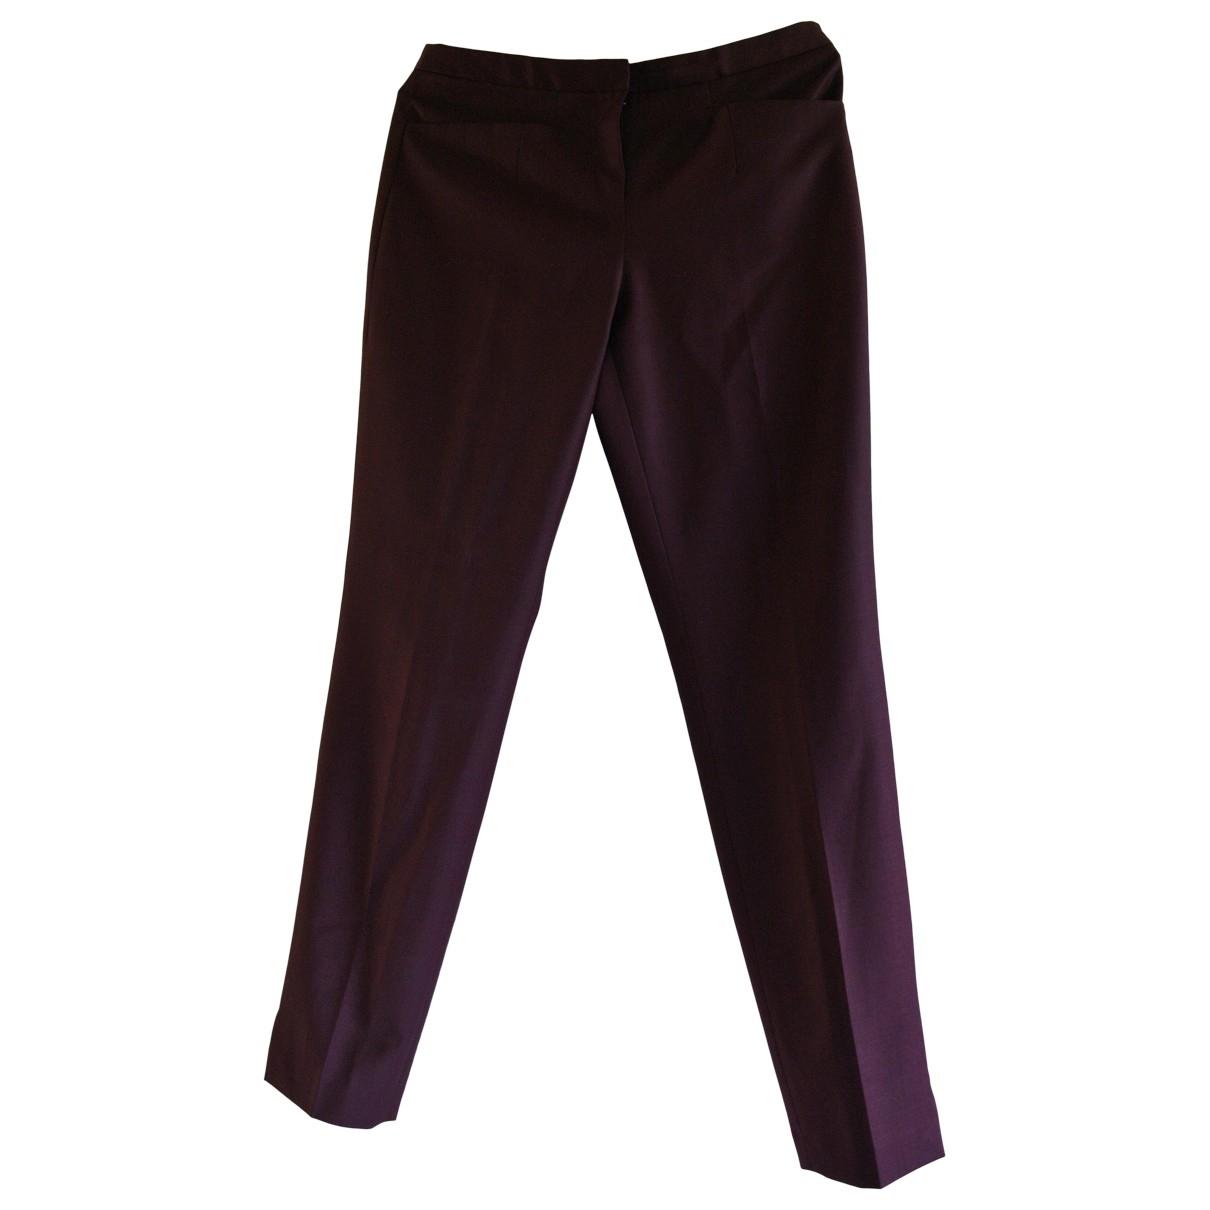 Ted Baker \N Burgundy Wool Trousers for Women 1 0-5